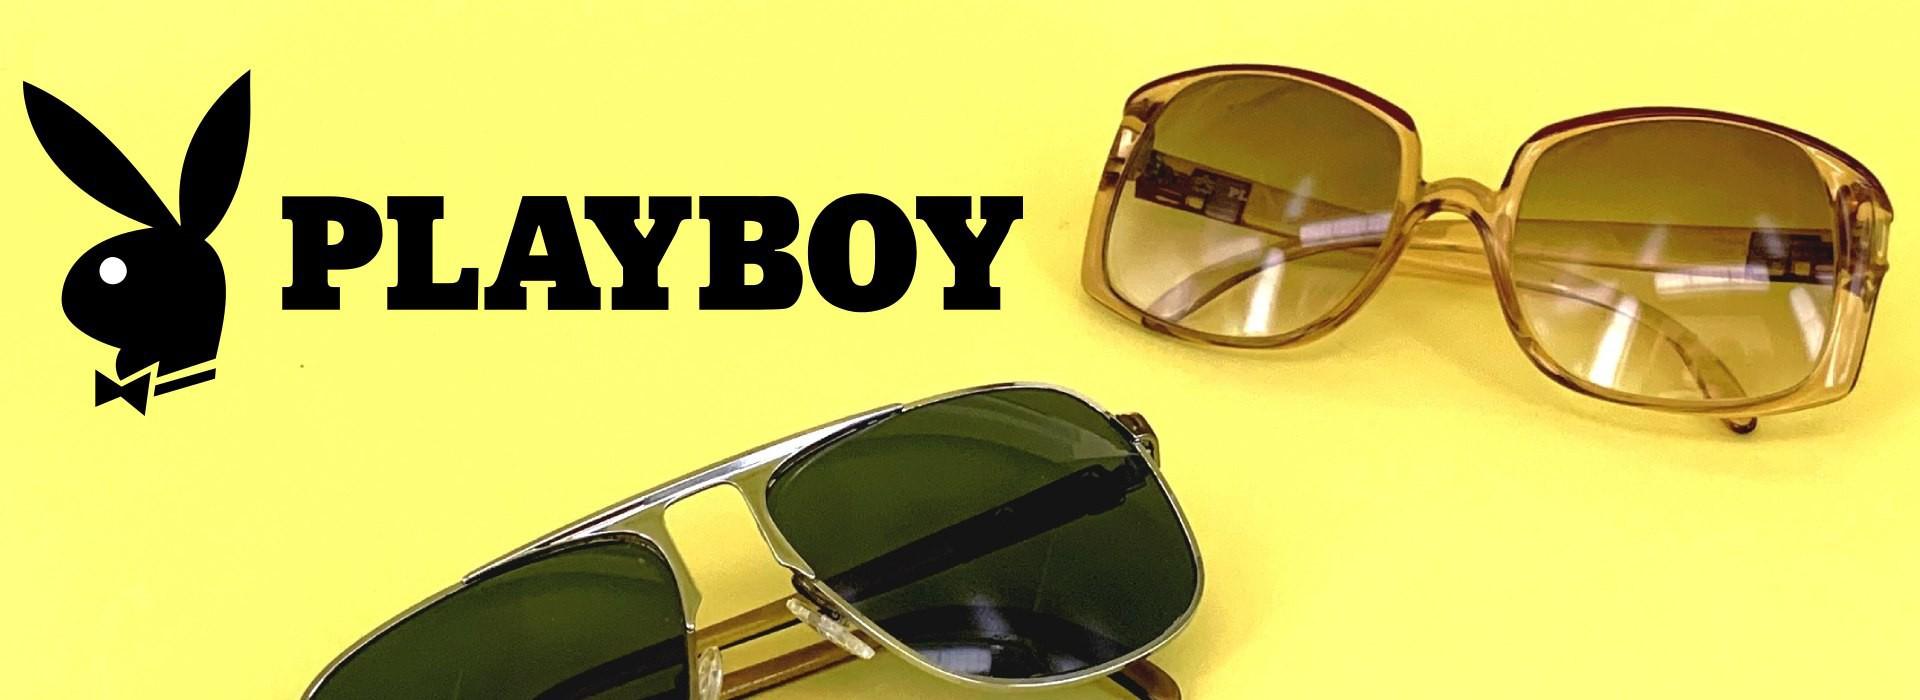 Playboy designer vintage sunglasses